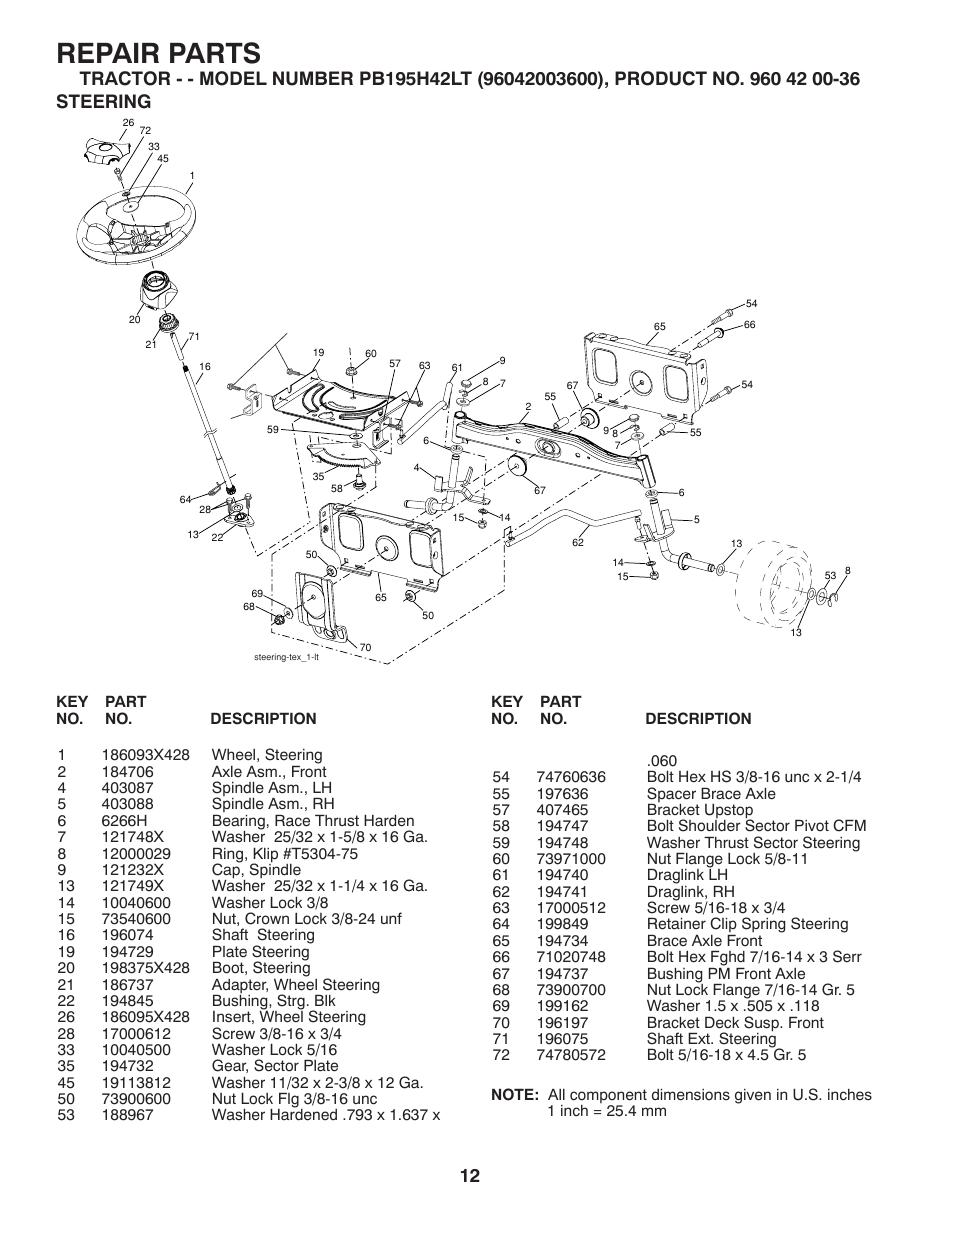 Poulan Repair Manual Pb195h42lt 1994 Oldsmobile Achieva 2400 Battery Fuse Box Diagram Array Steering Parts Pro Lawn Tractor User Rh Manualsdir Com